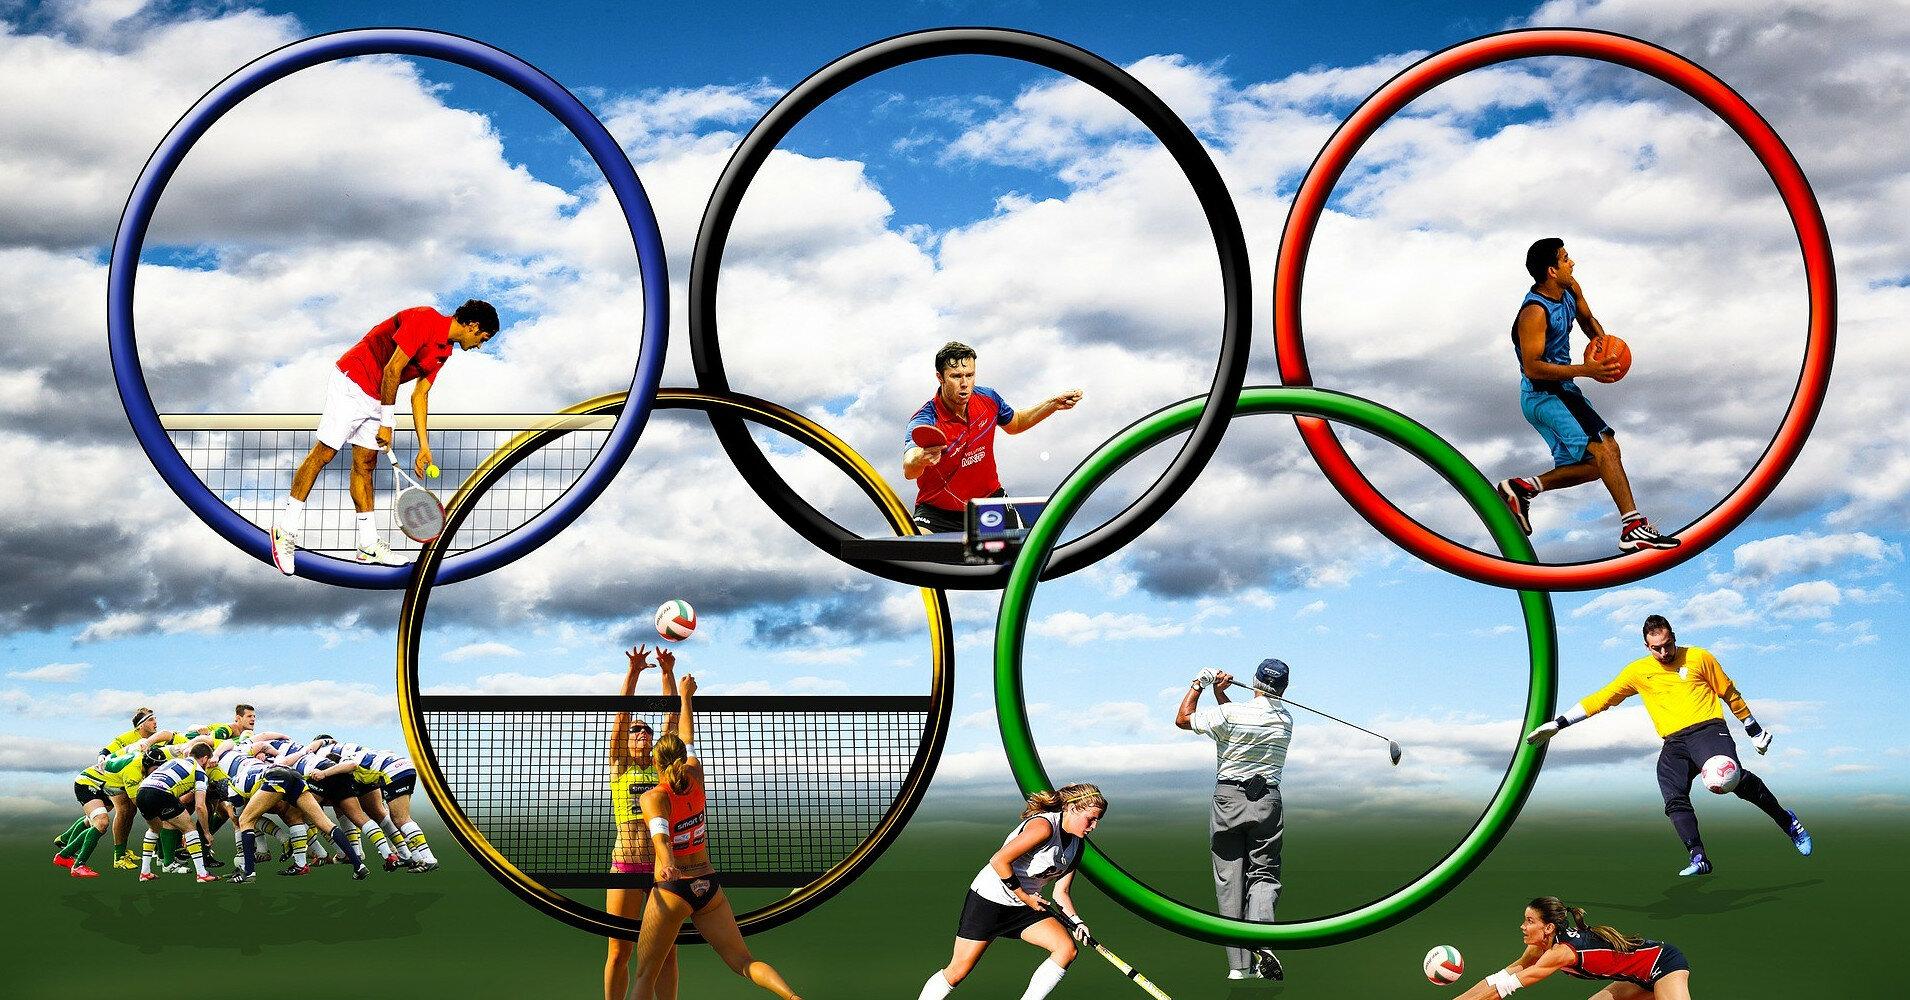 МОК отказал Словении на открытии Олимпиады пронести флаг ЕС